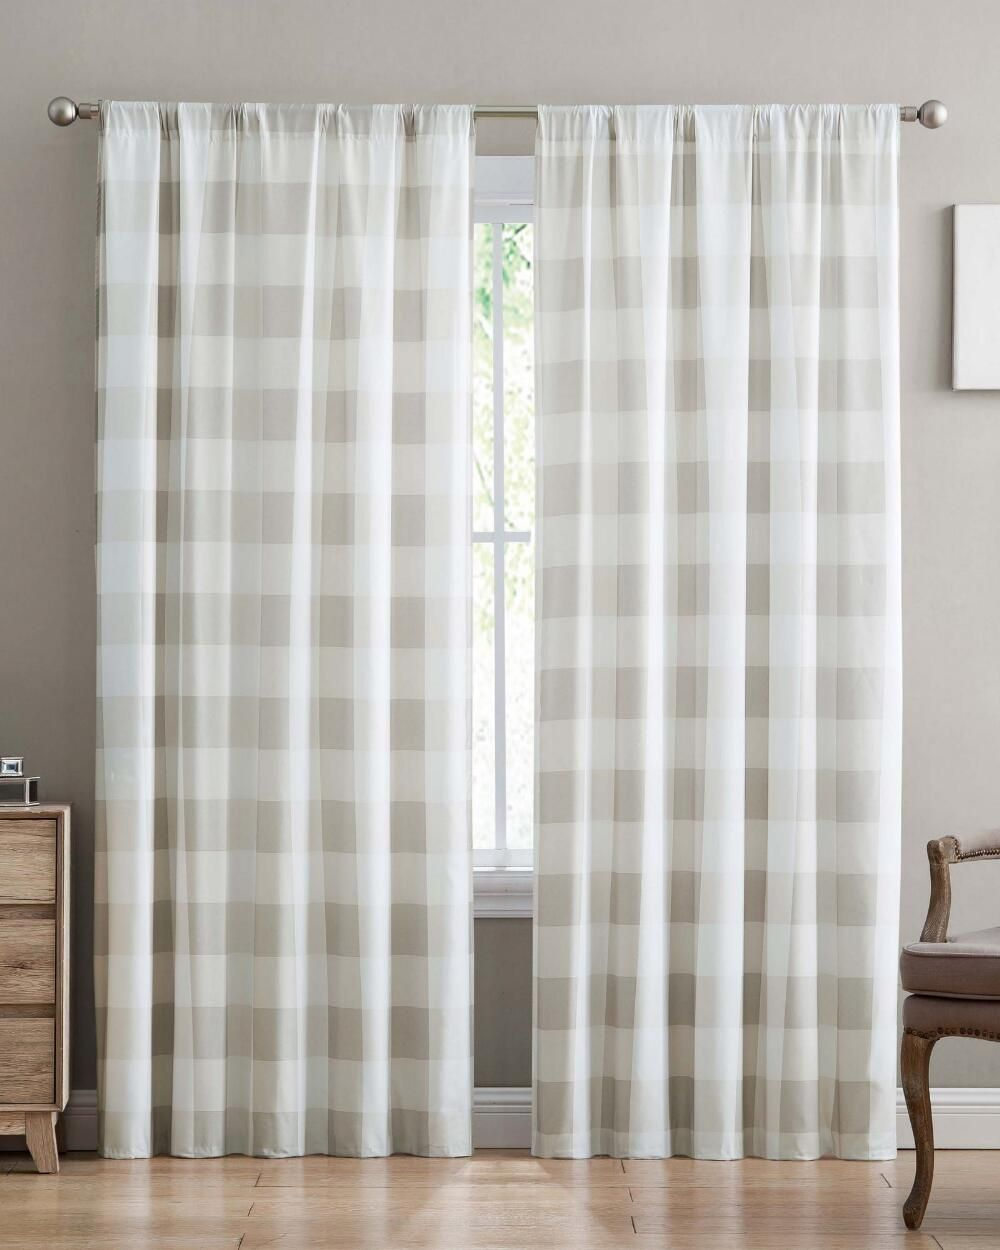 Truly Soft Everyday Buffalo Plaid Curtain Panel Set Of 2 84l 50w